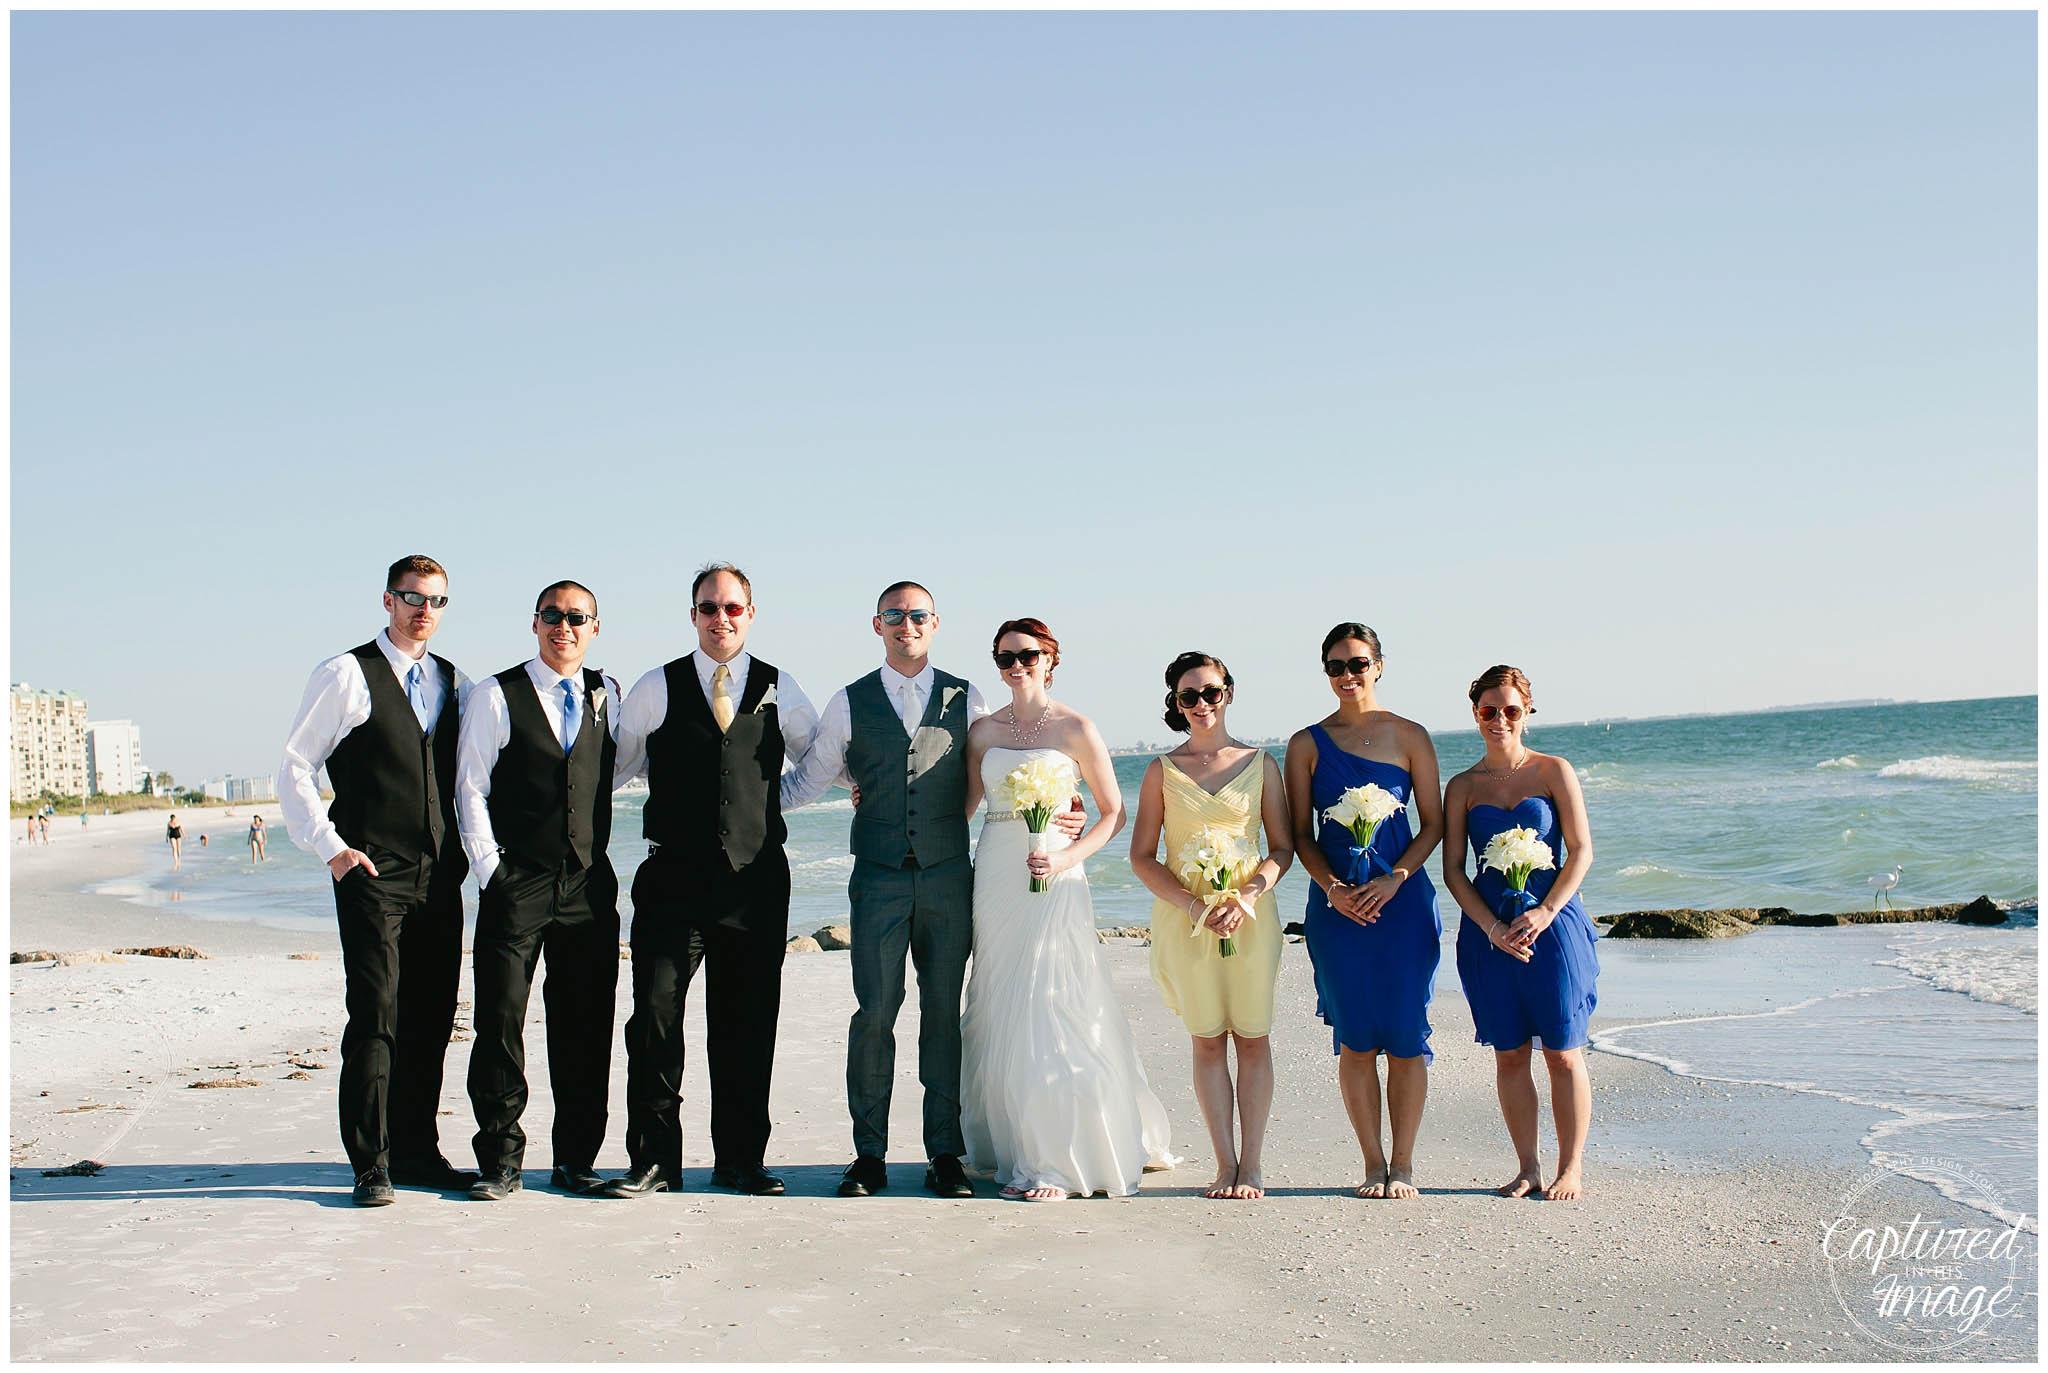 St. Pete Beach Destination Wedding (11 of 81)